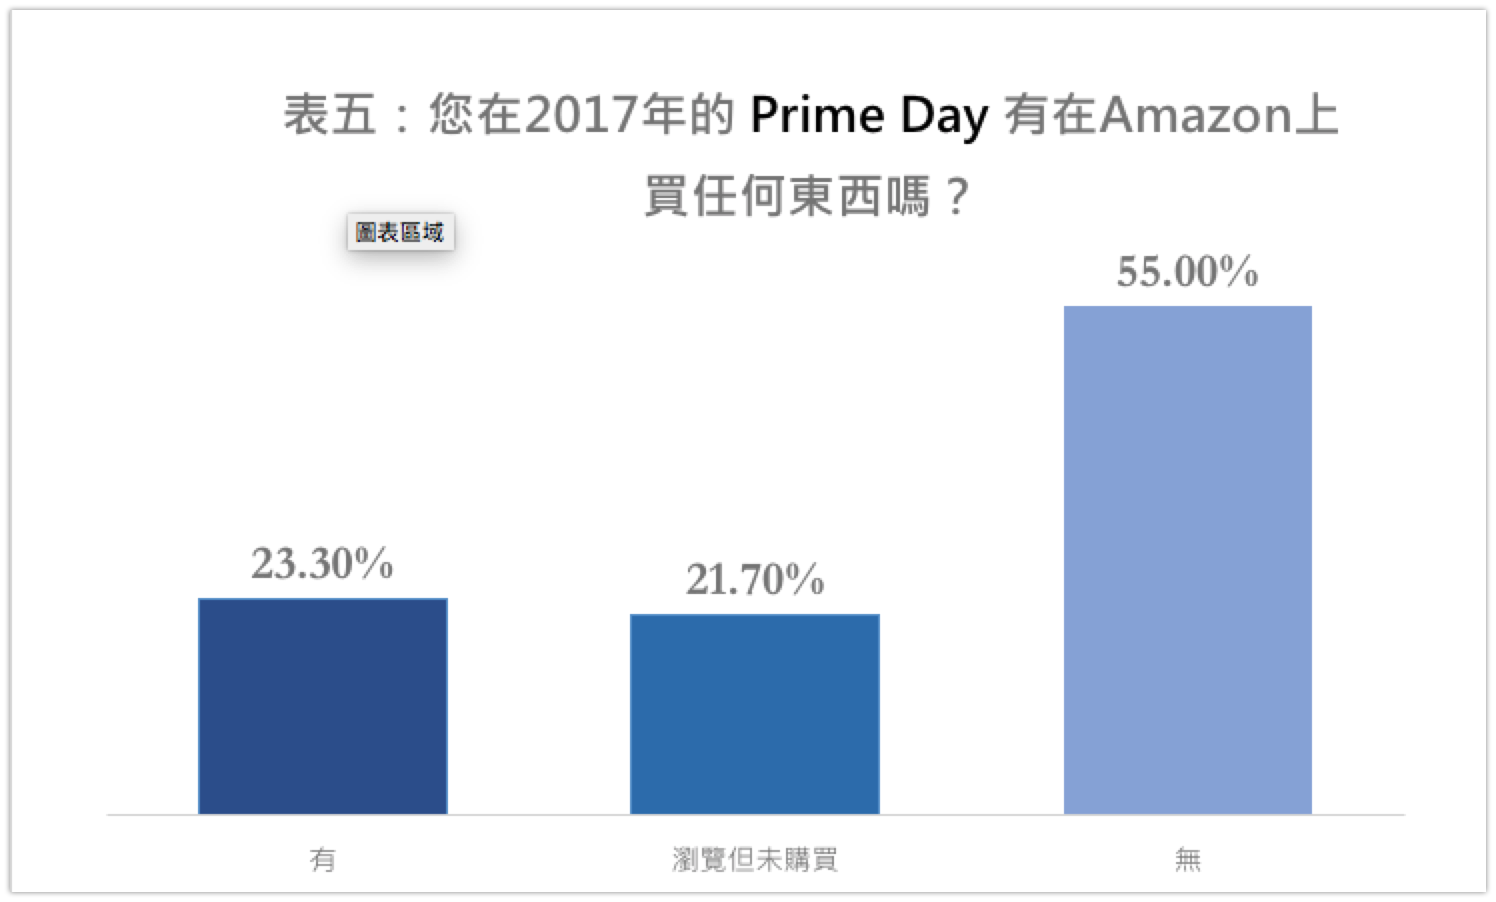 2017 Primeday是否在Amazon上購物